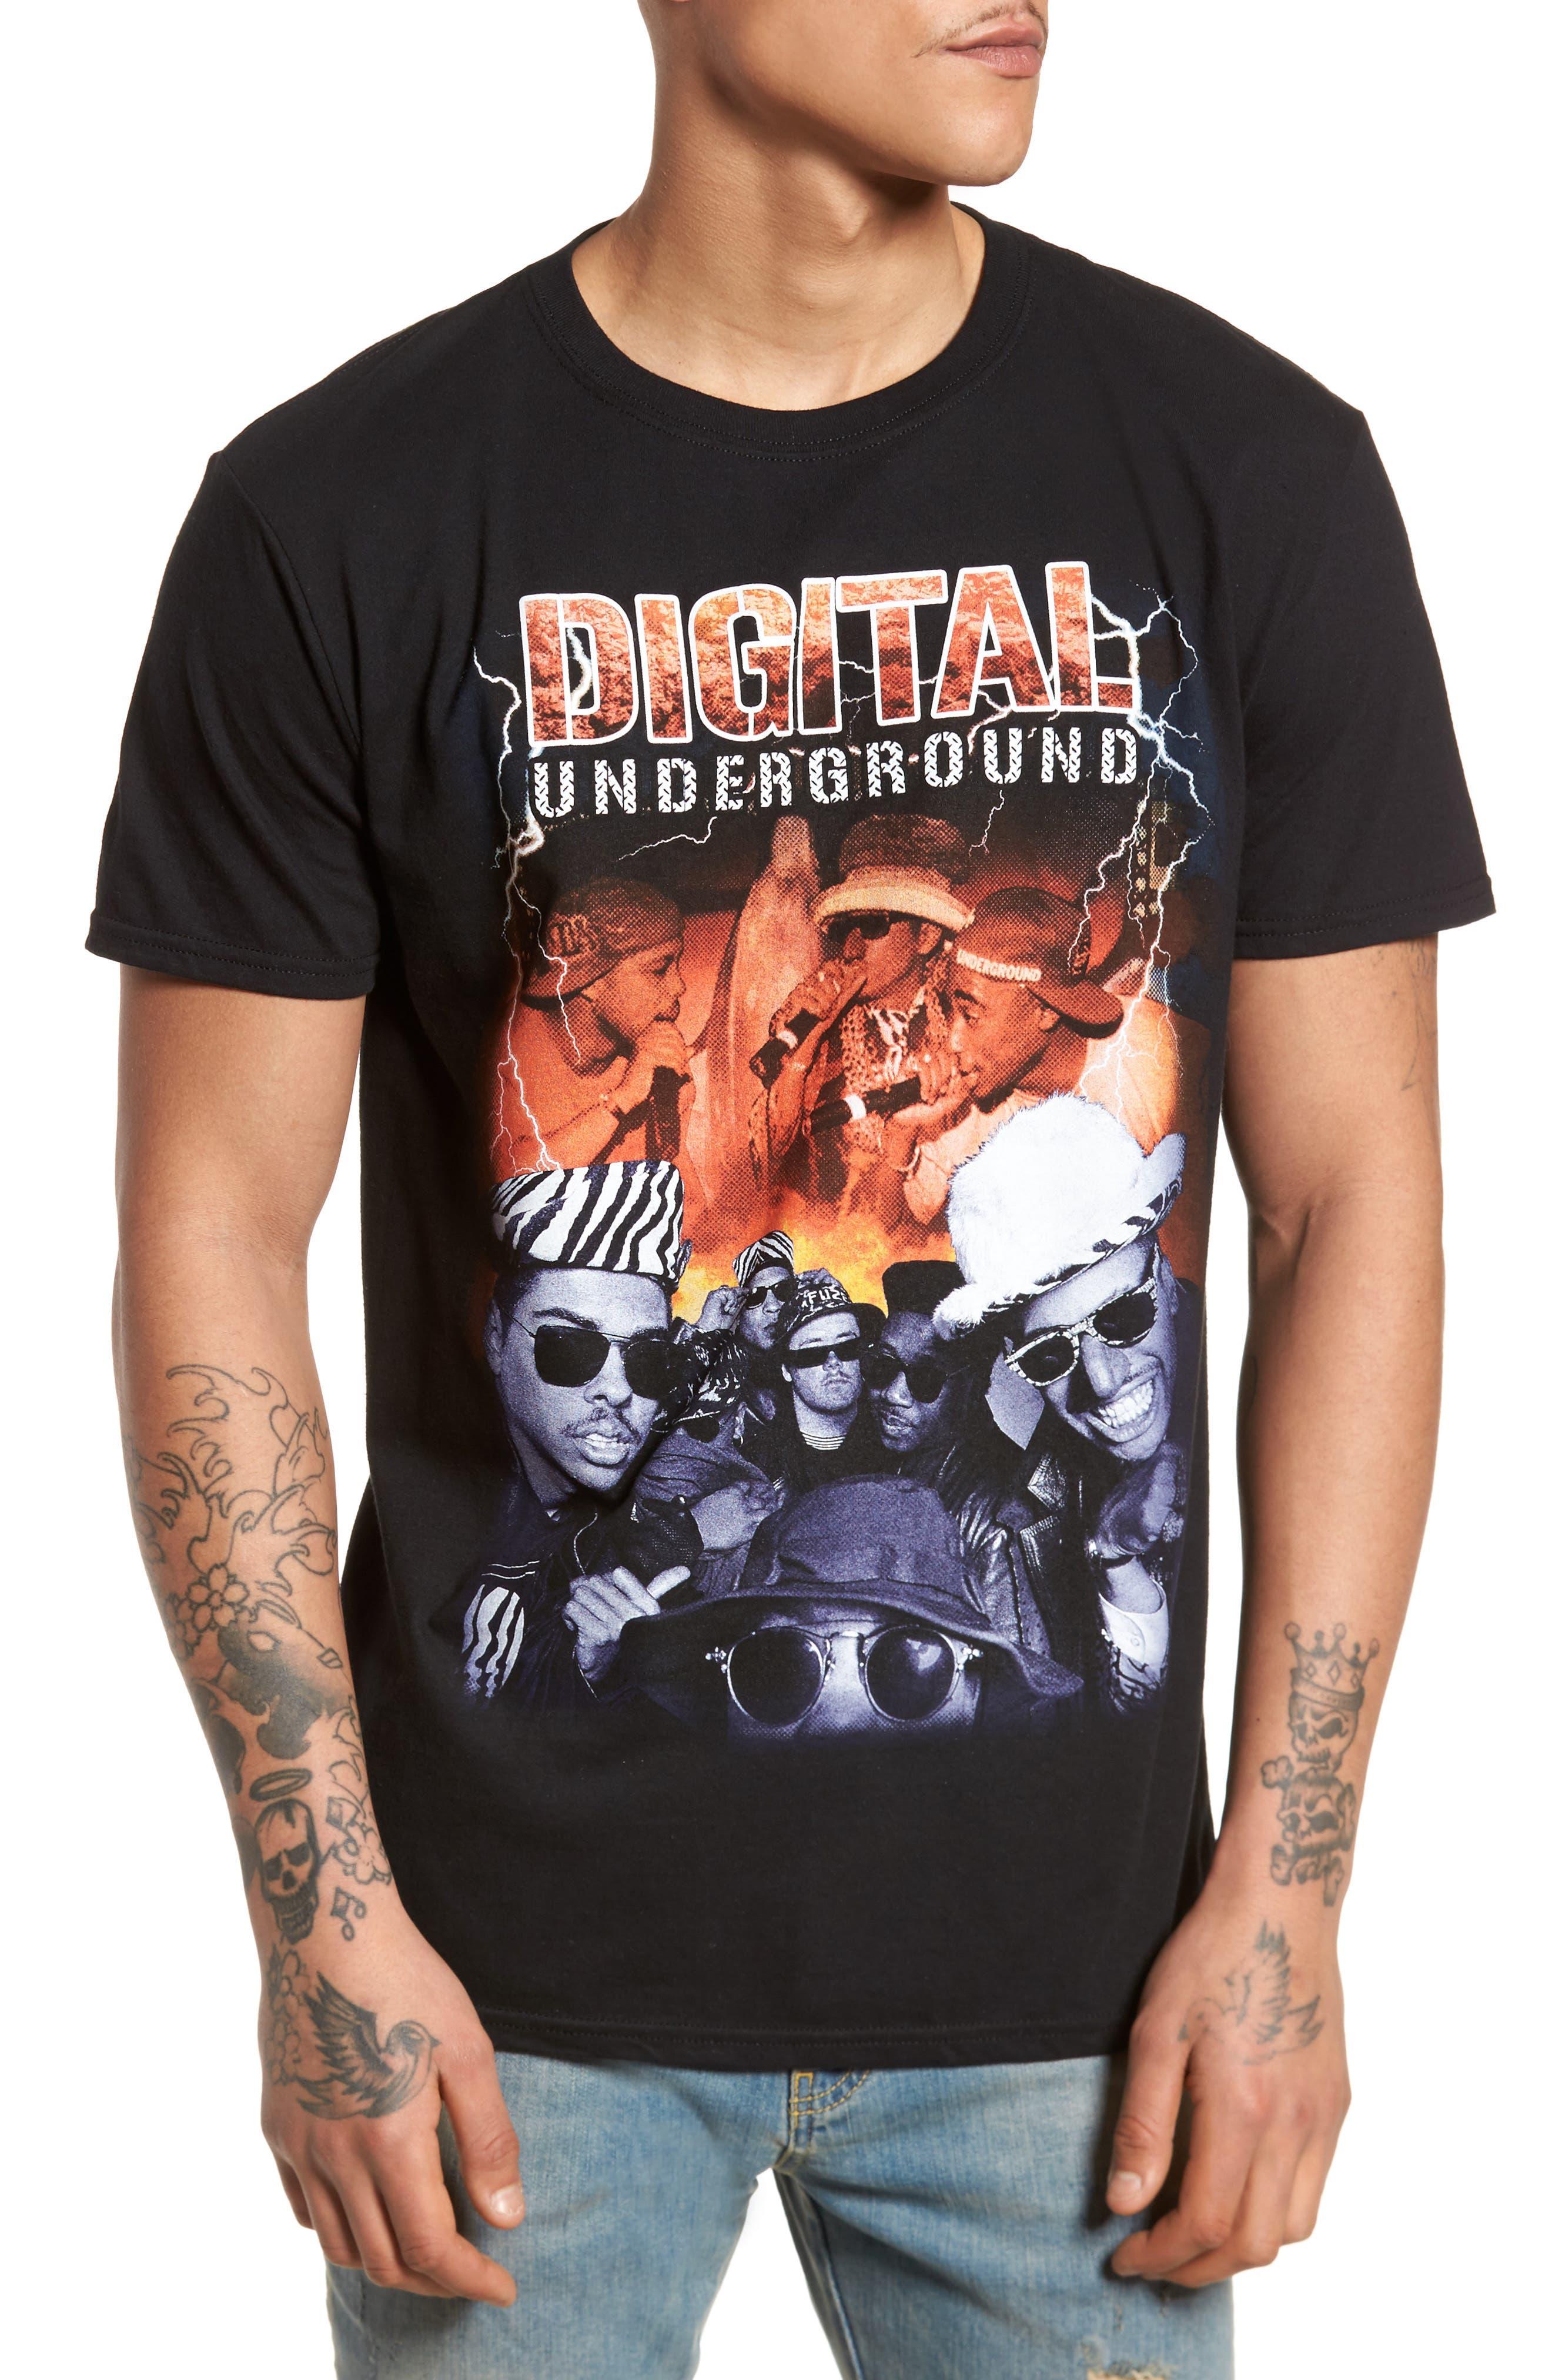 Digital Underground Graphic T-Shirt,                             Main thumbnail 1, color,                             Black Lightning D. Underground